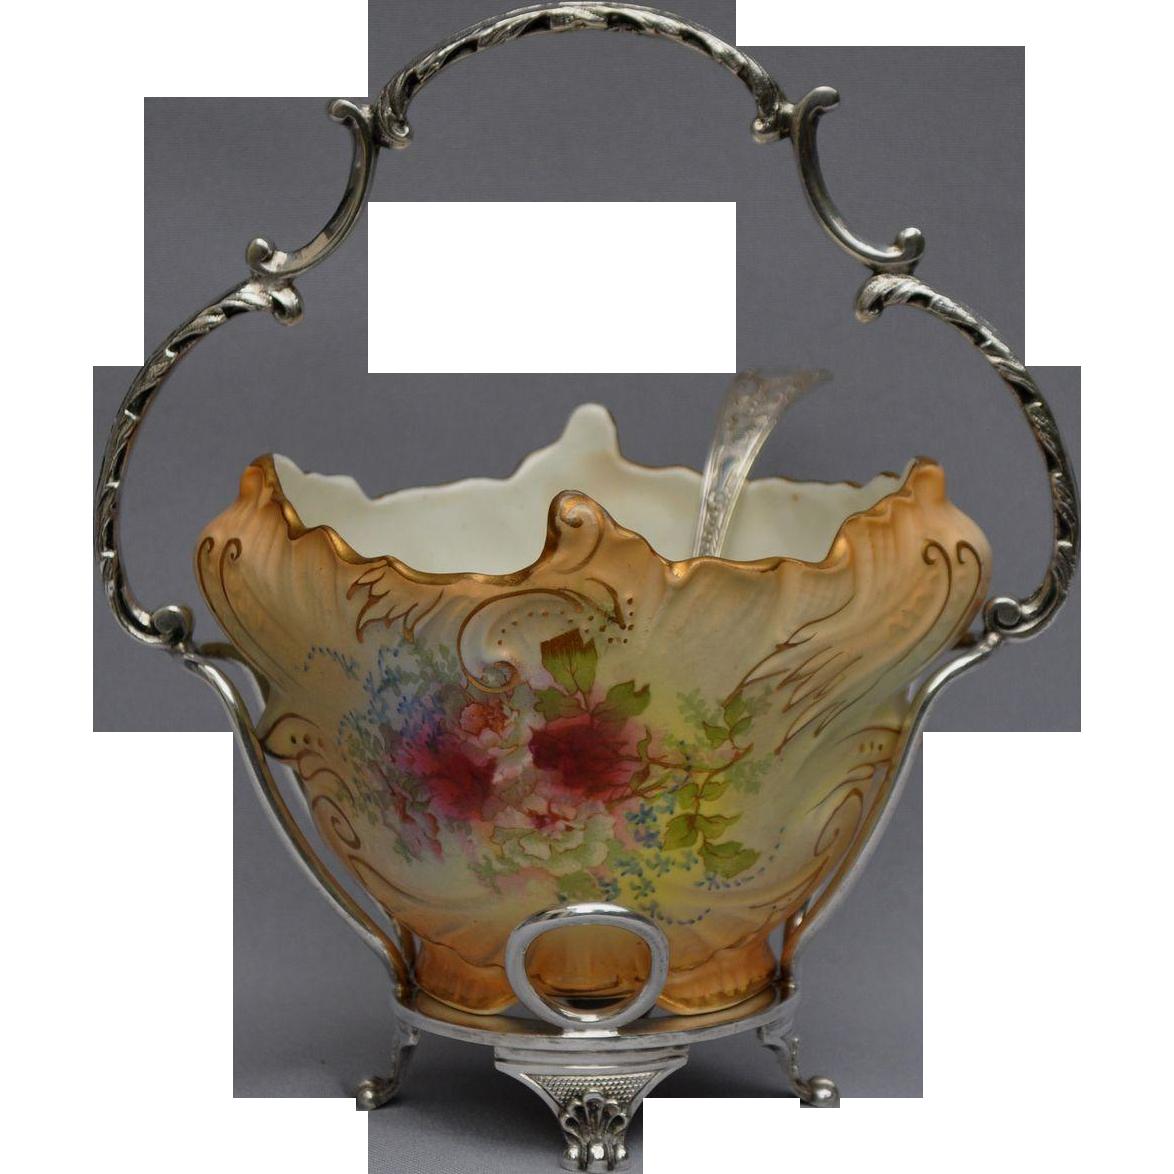 Pottery Crown Devon Fieldings Sugar Bowl EPNS Rococo Empire Spoon Antique